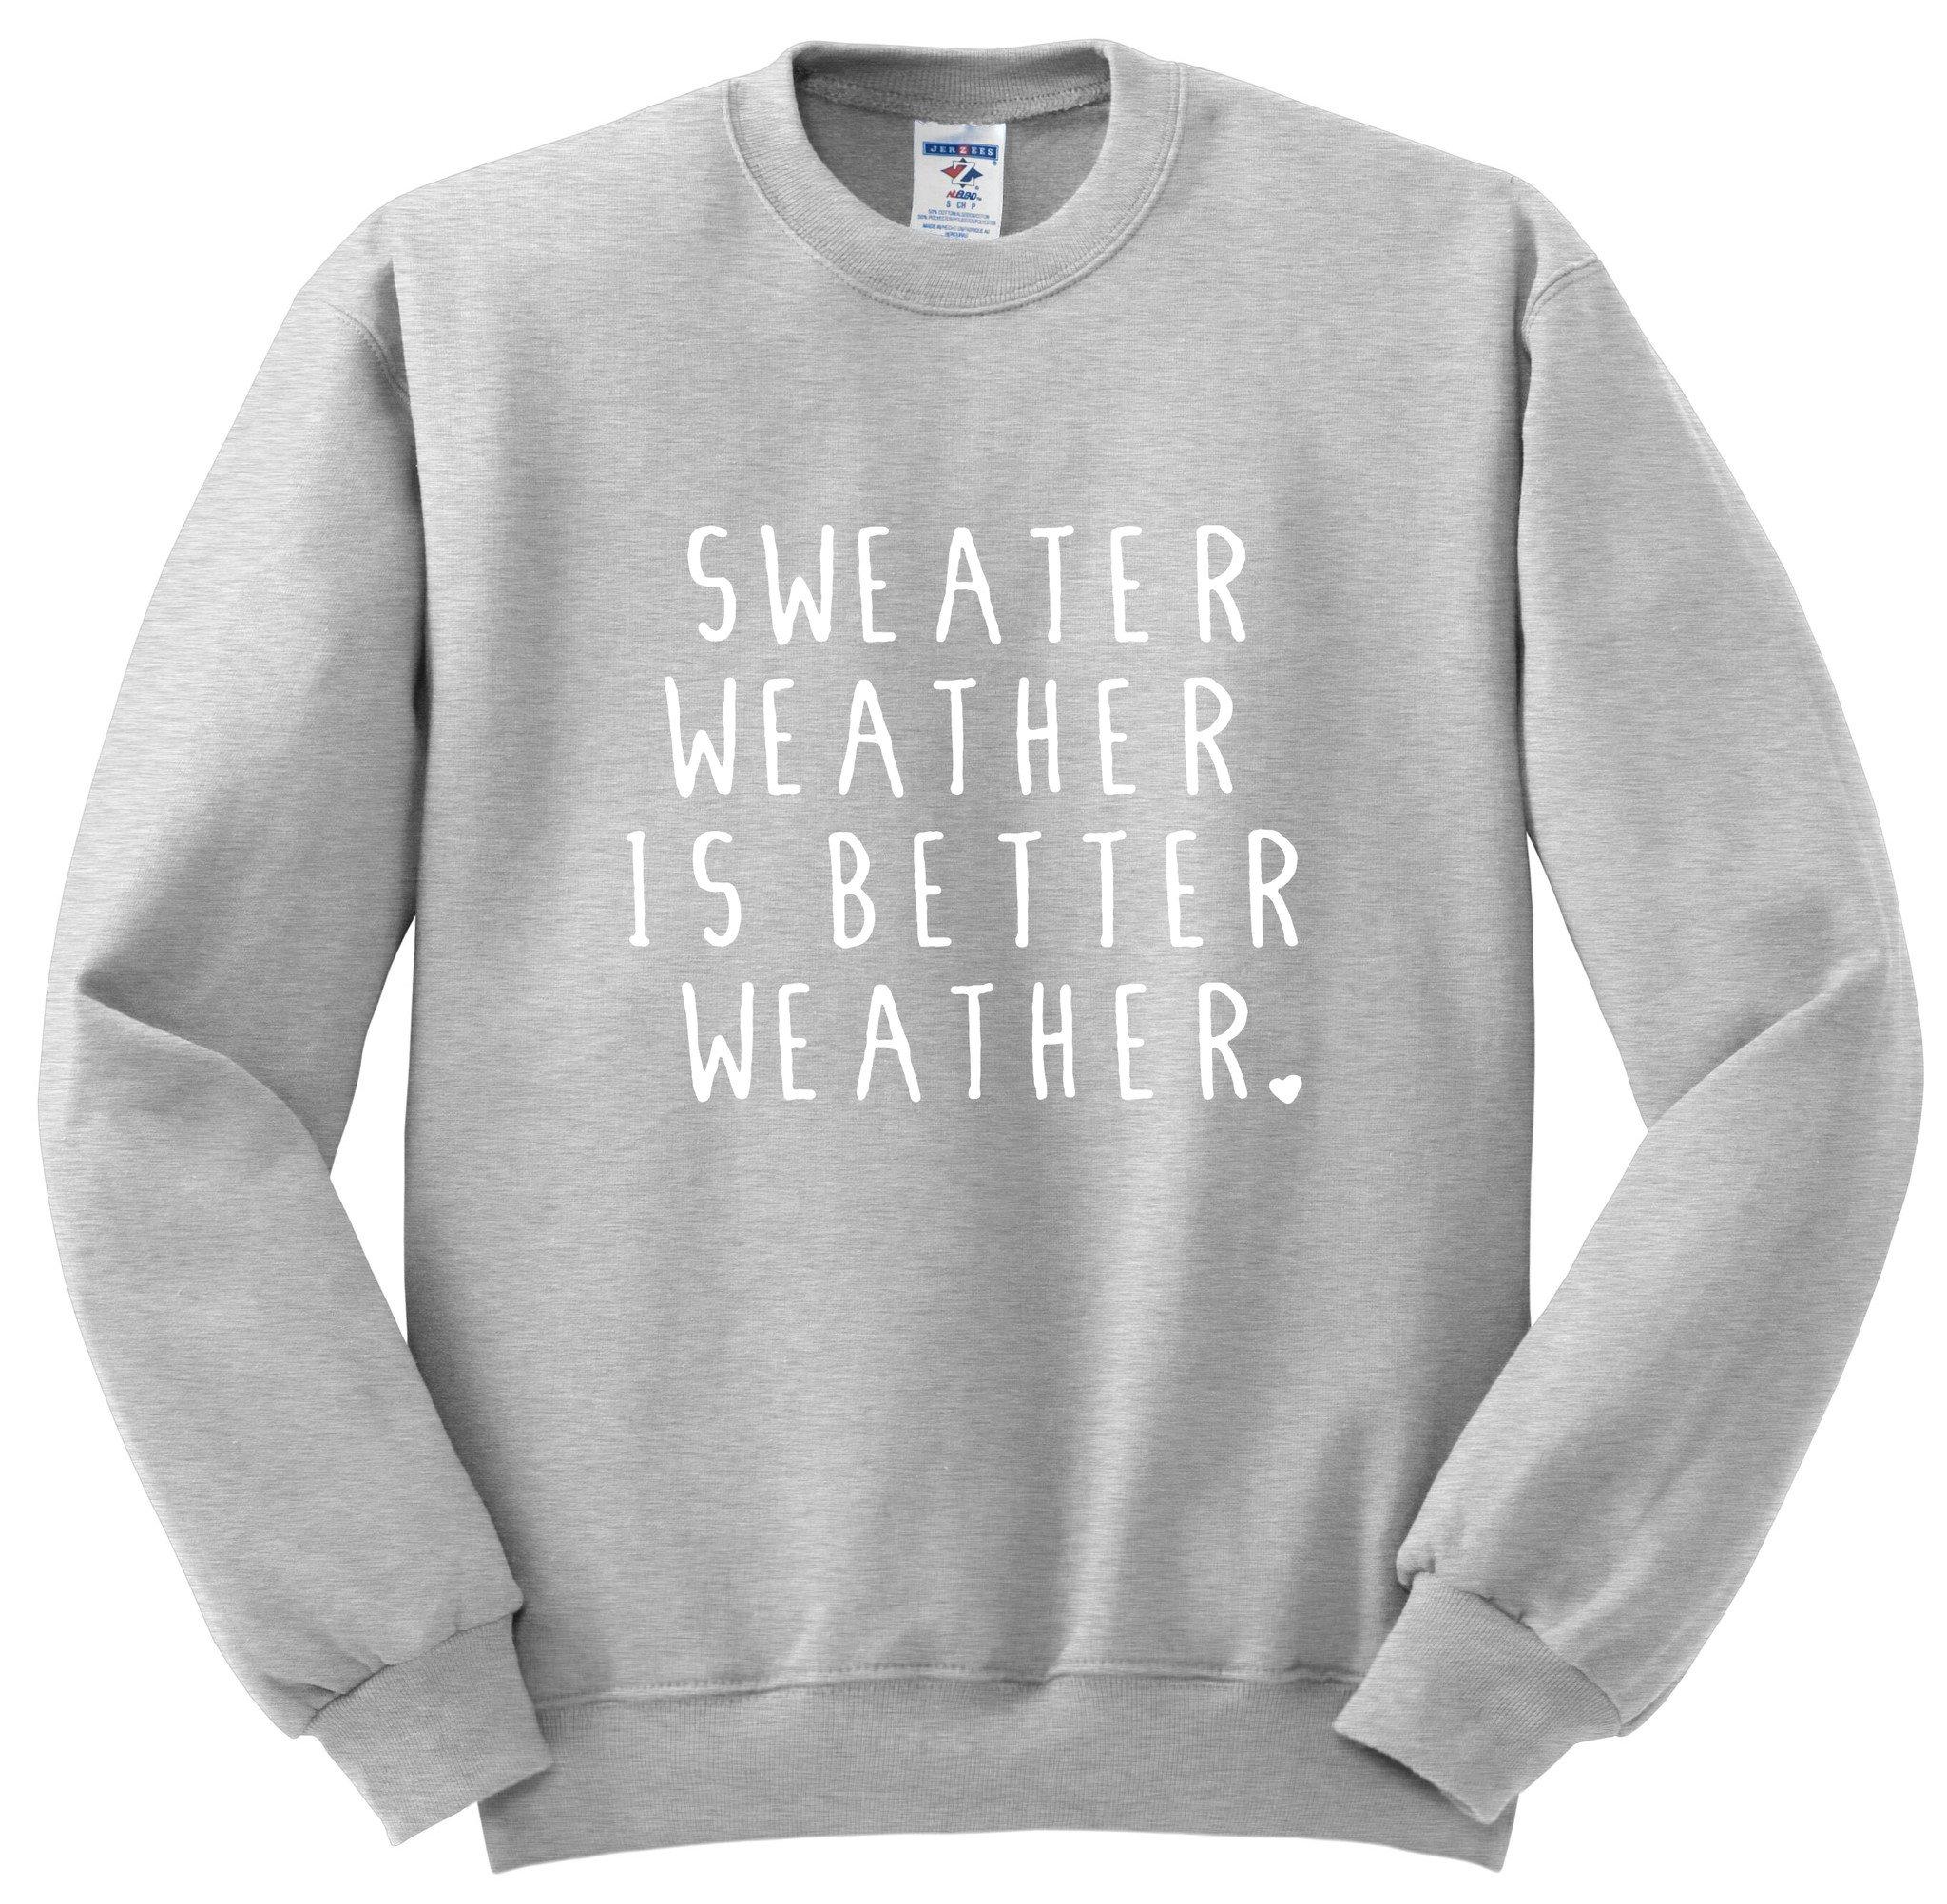 Sweater Weather is better sweatshirt